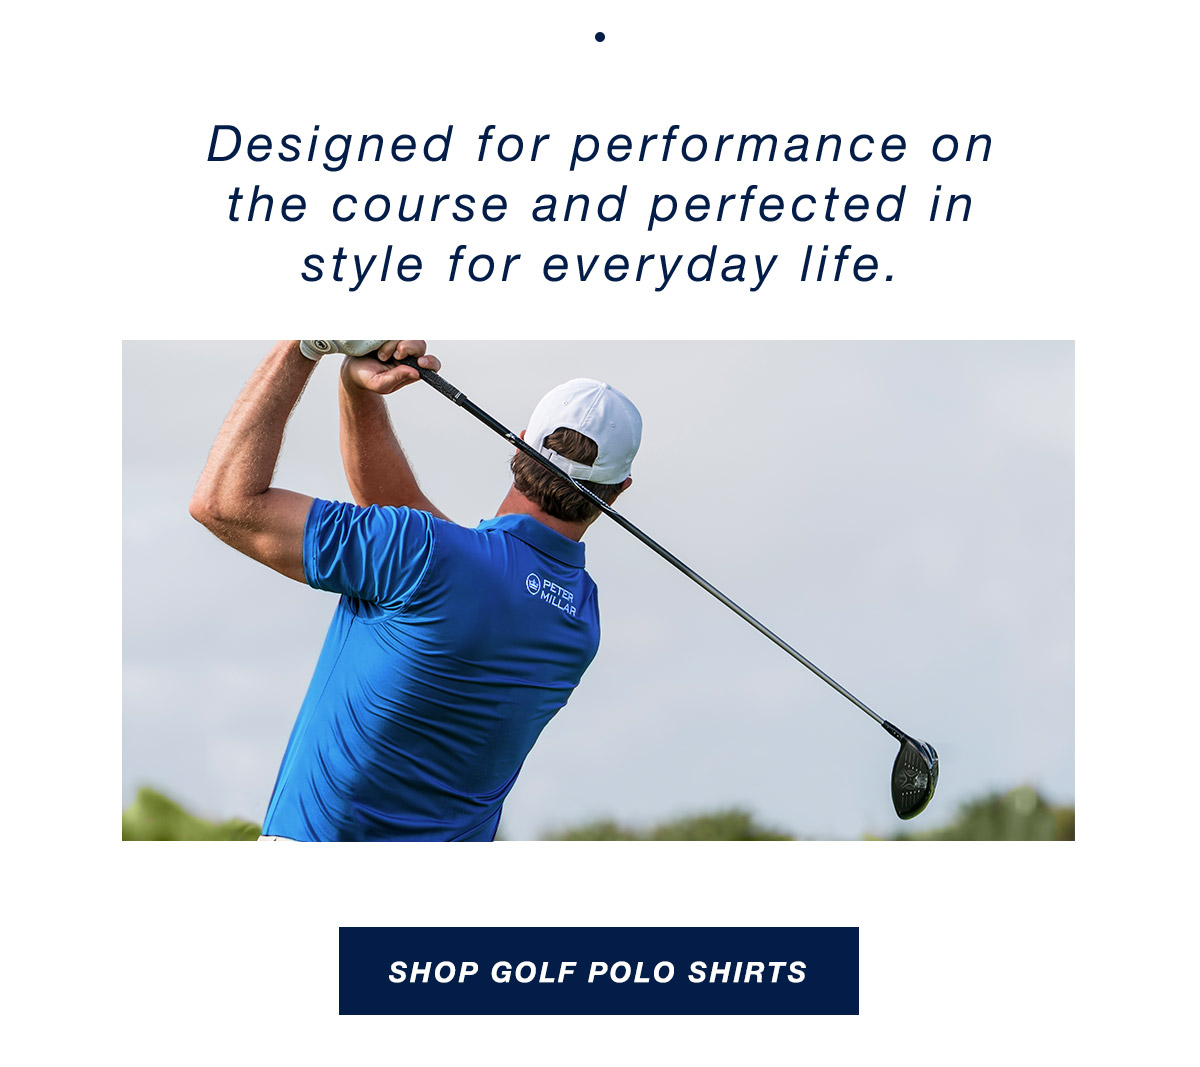 Shop Golf Polo Shirts